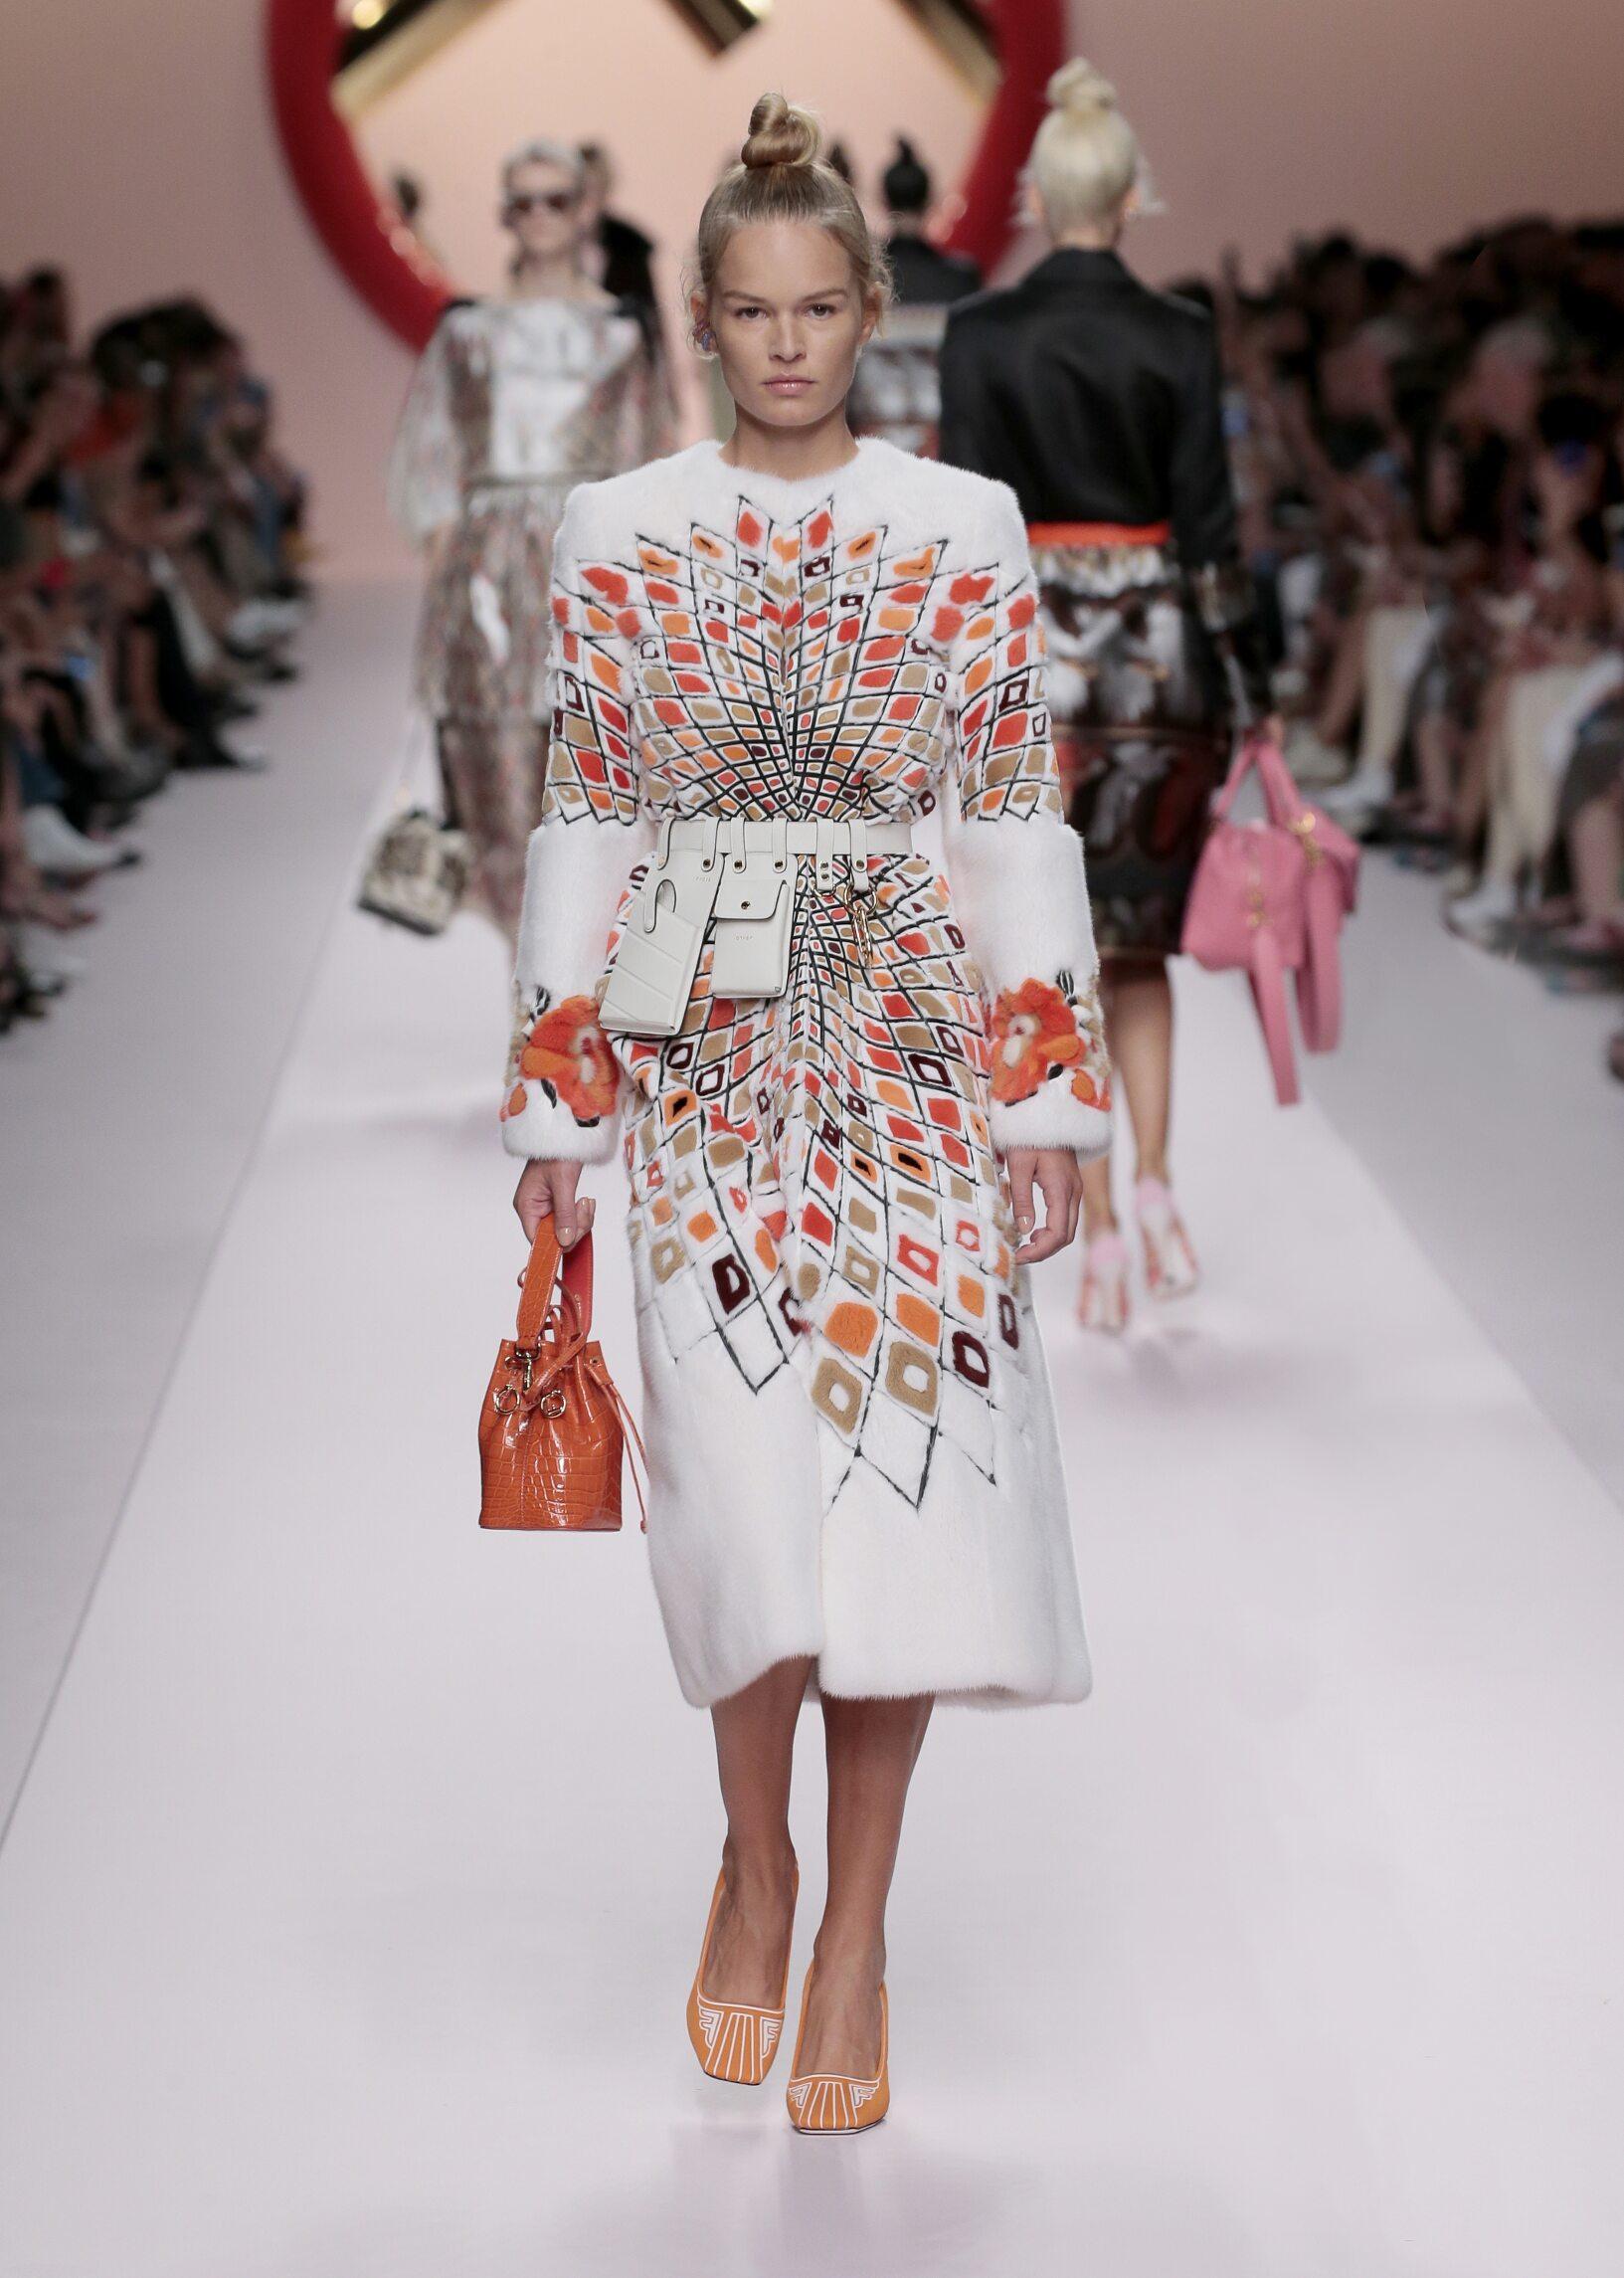 Fendi Womenswear Collection Trends